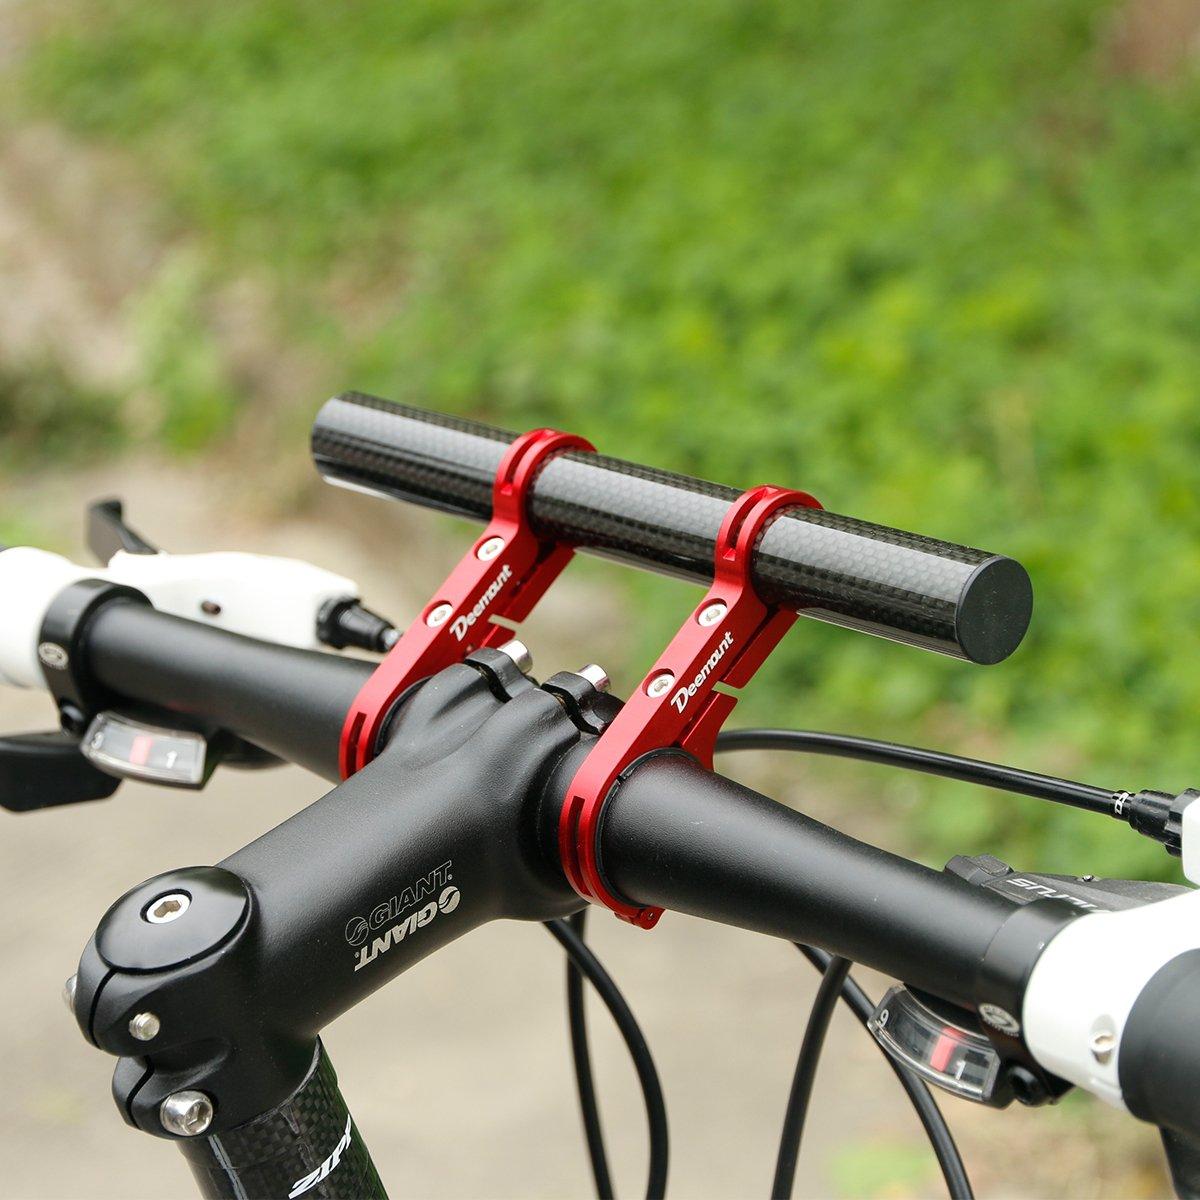 DEEMOUNT Bike Handlebar Extension Rack 202mm Bicycle Double Clamp Bracket Carbon Fiber Extender Accessories Flashlight Lamp Phone Mount Bracket Stand Holder Space Saver - Red by DEEMOUNT (Image #4)